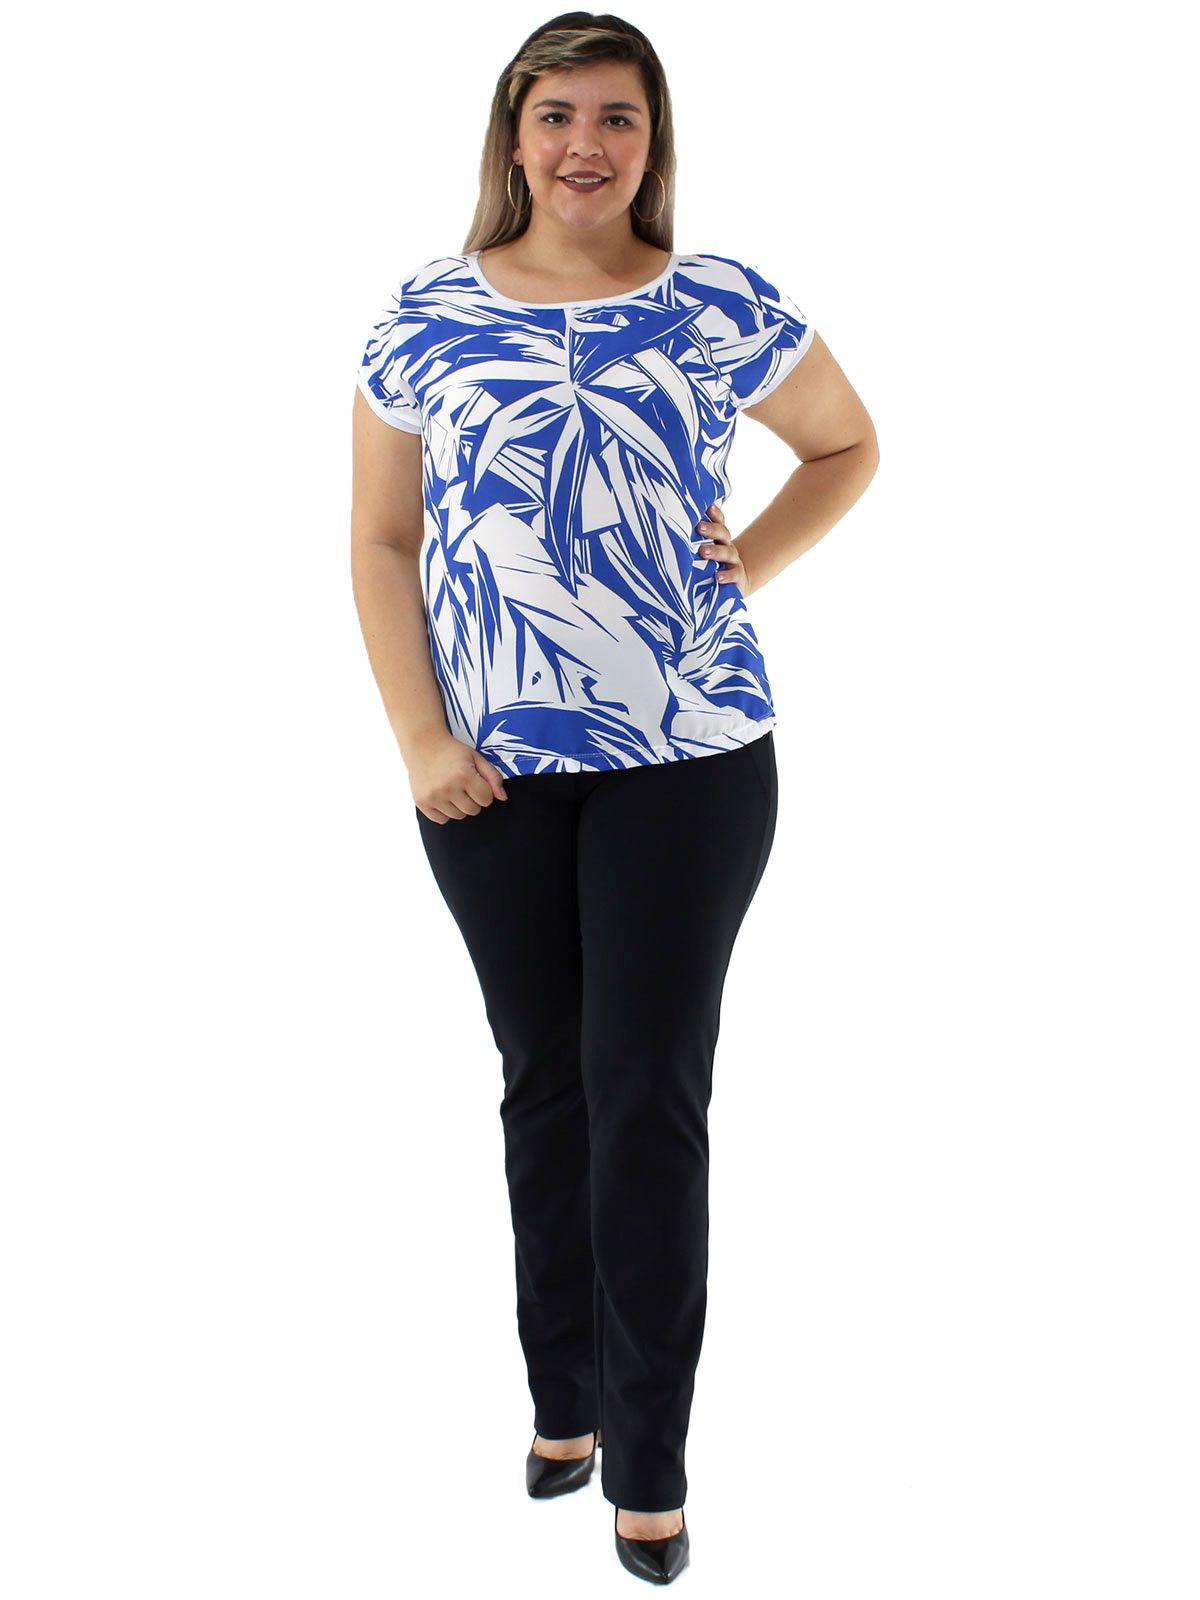 Blusa Plus Size Feminina Decote Redondo Estampada Azul